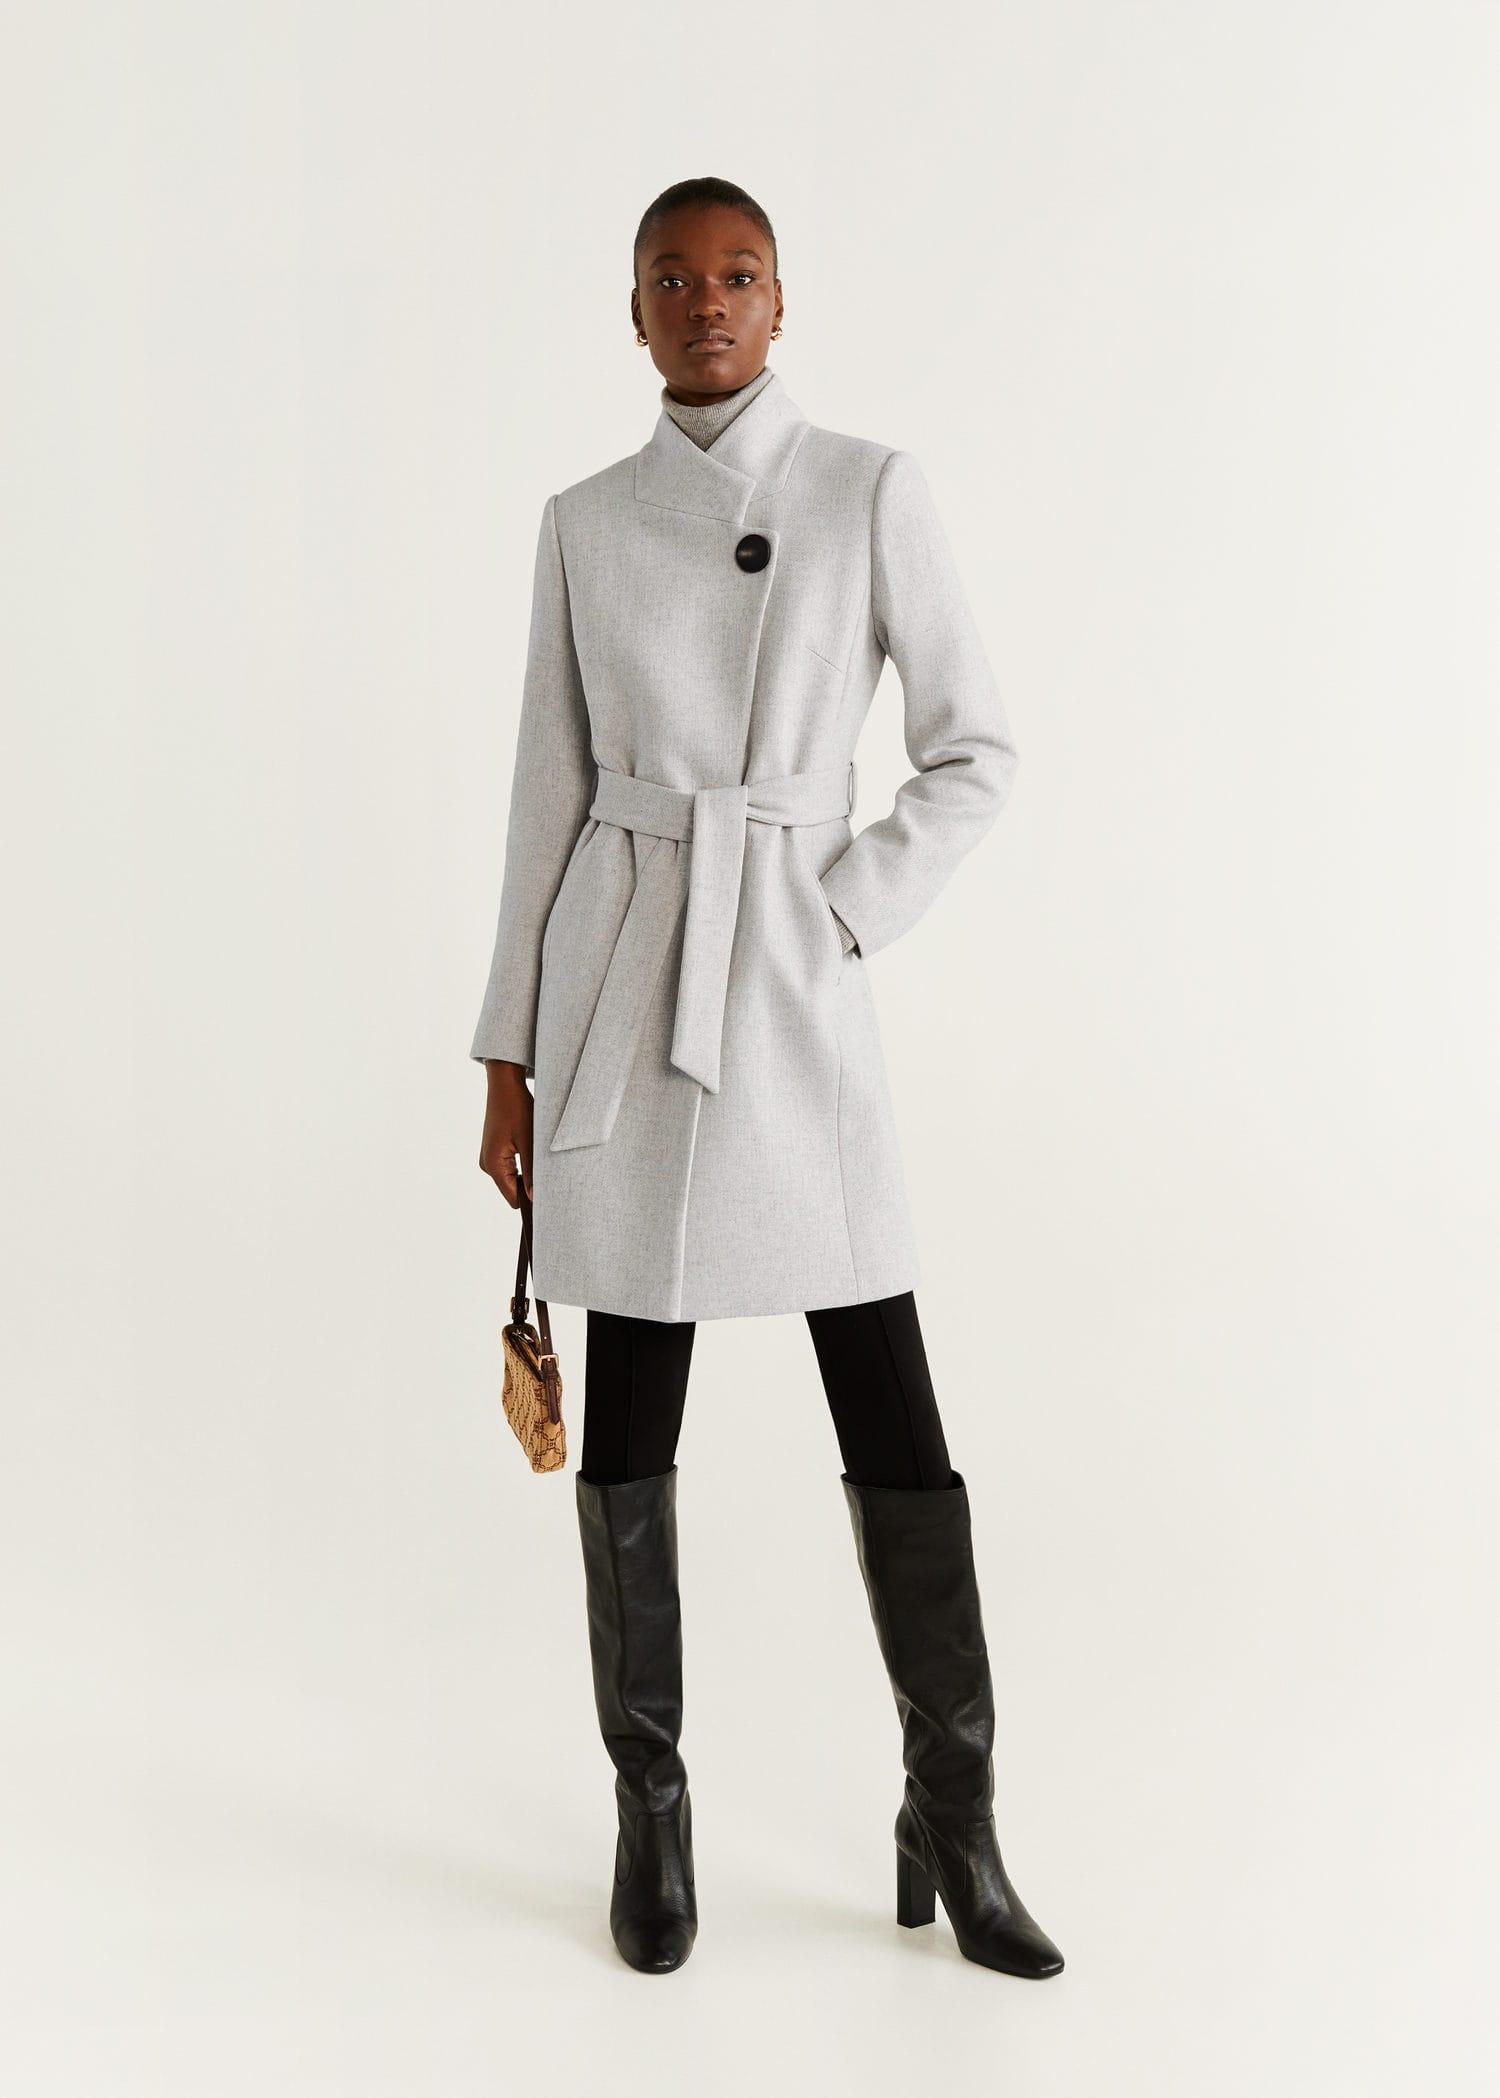 Damen Trenchcoats für Mäntel 2019Mango Luxemburg xBdoeC